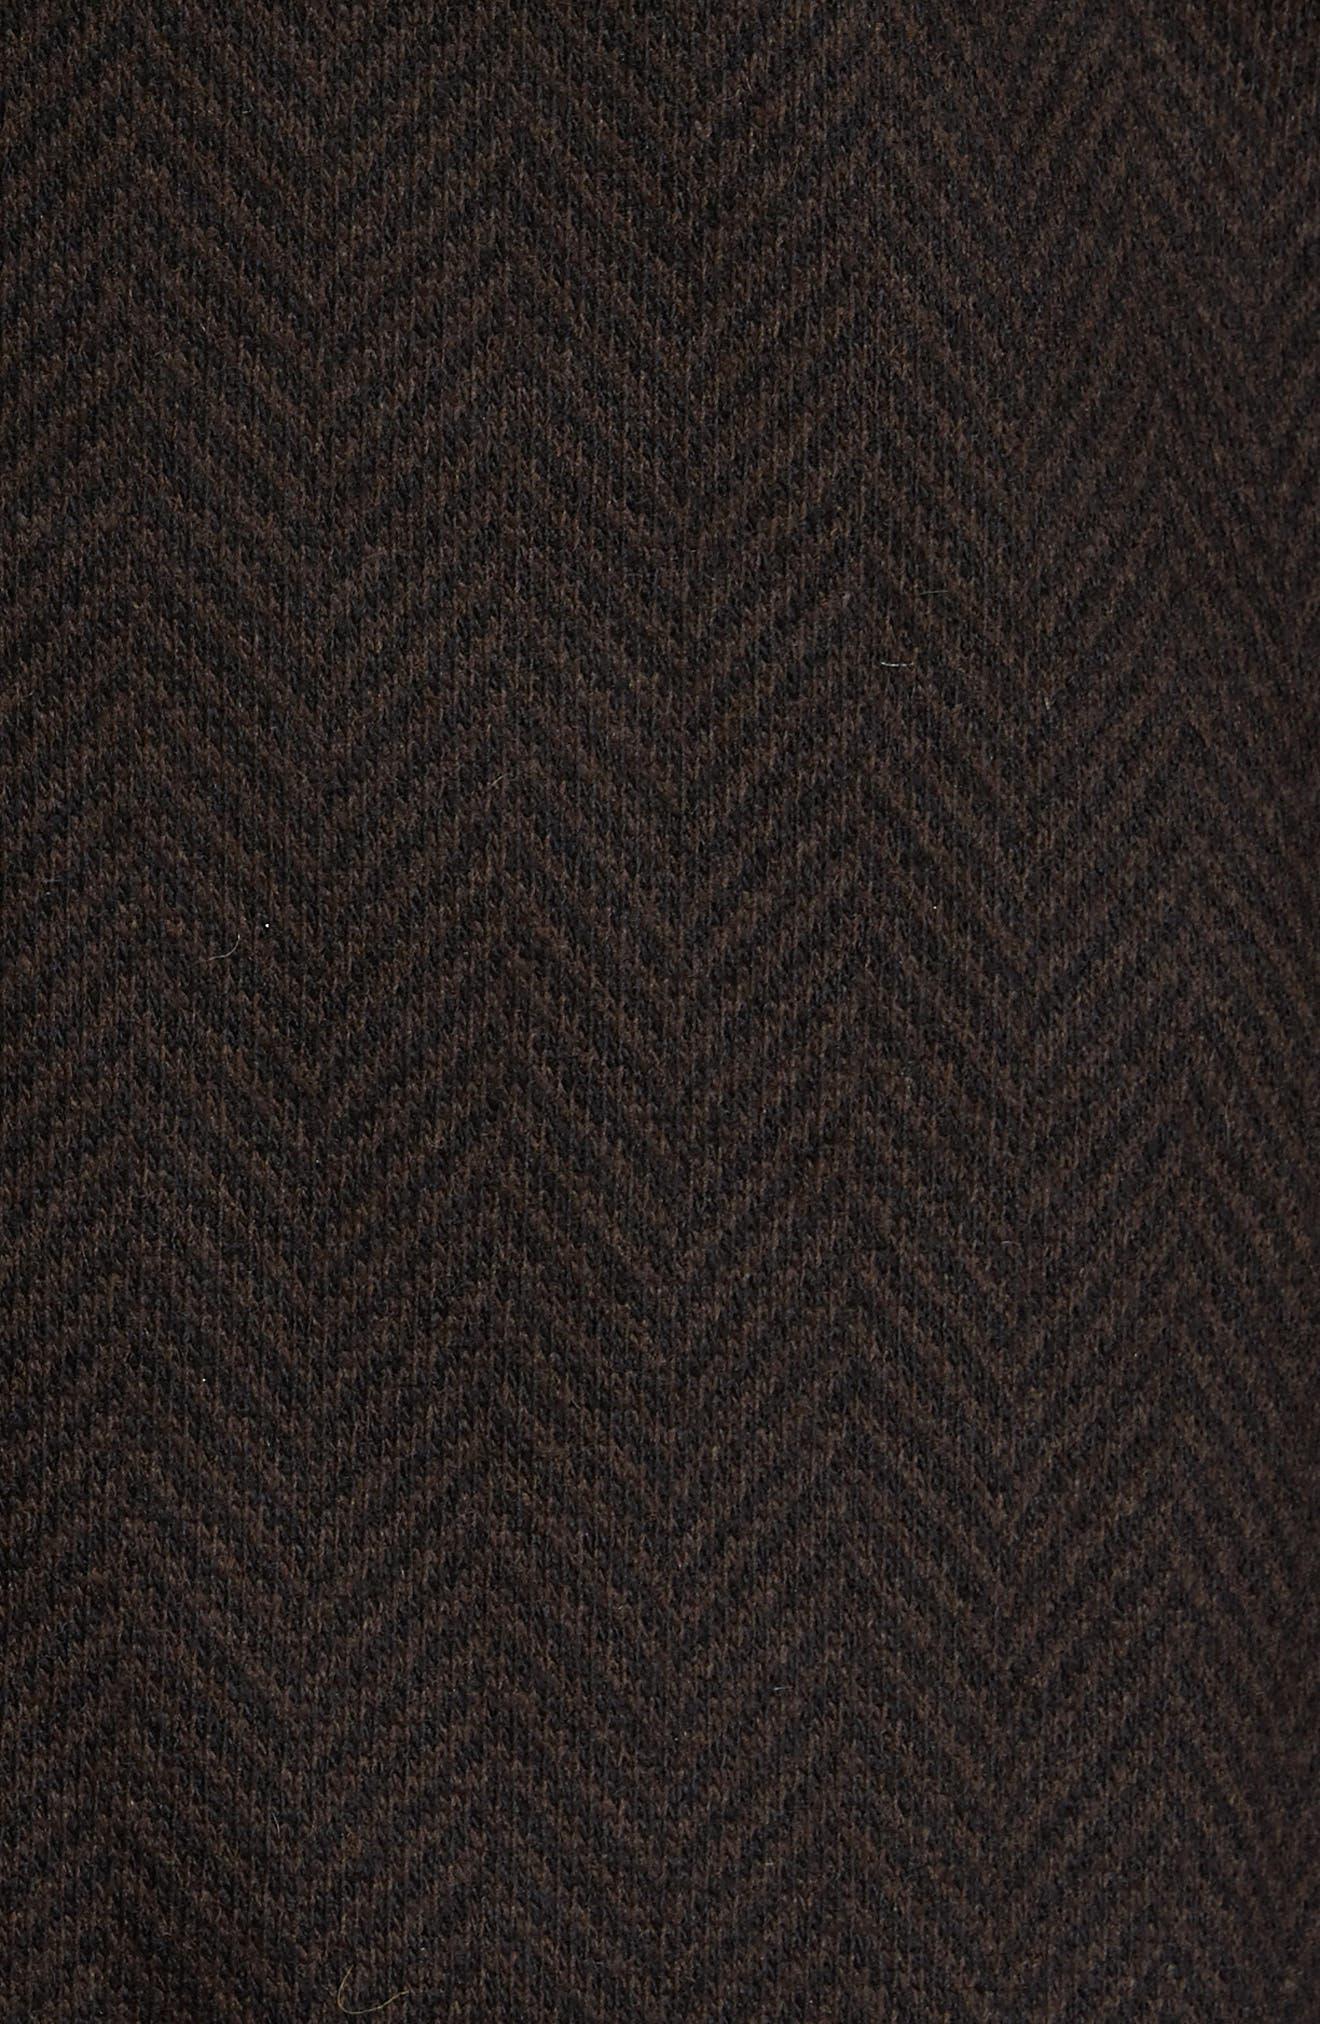 Laser Edge Wool Blend Jersey Sport Coat,                             Alternate thumbnail 6, color,                             201